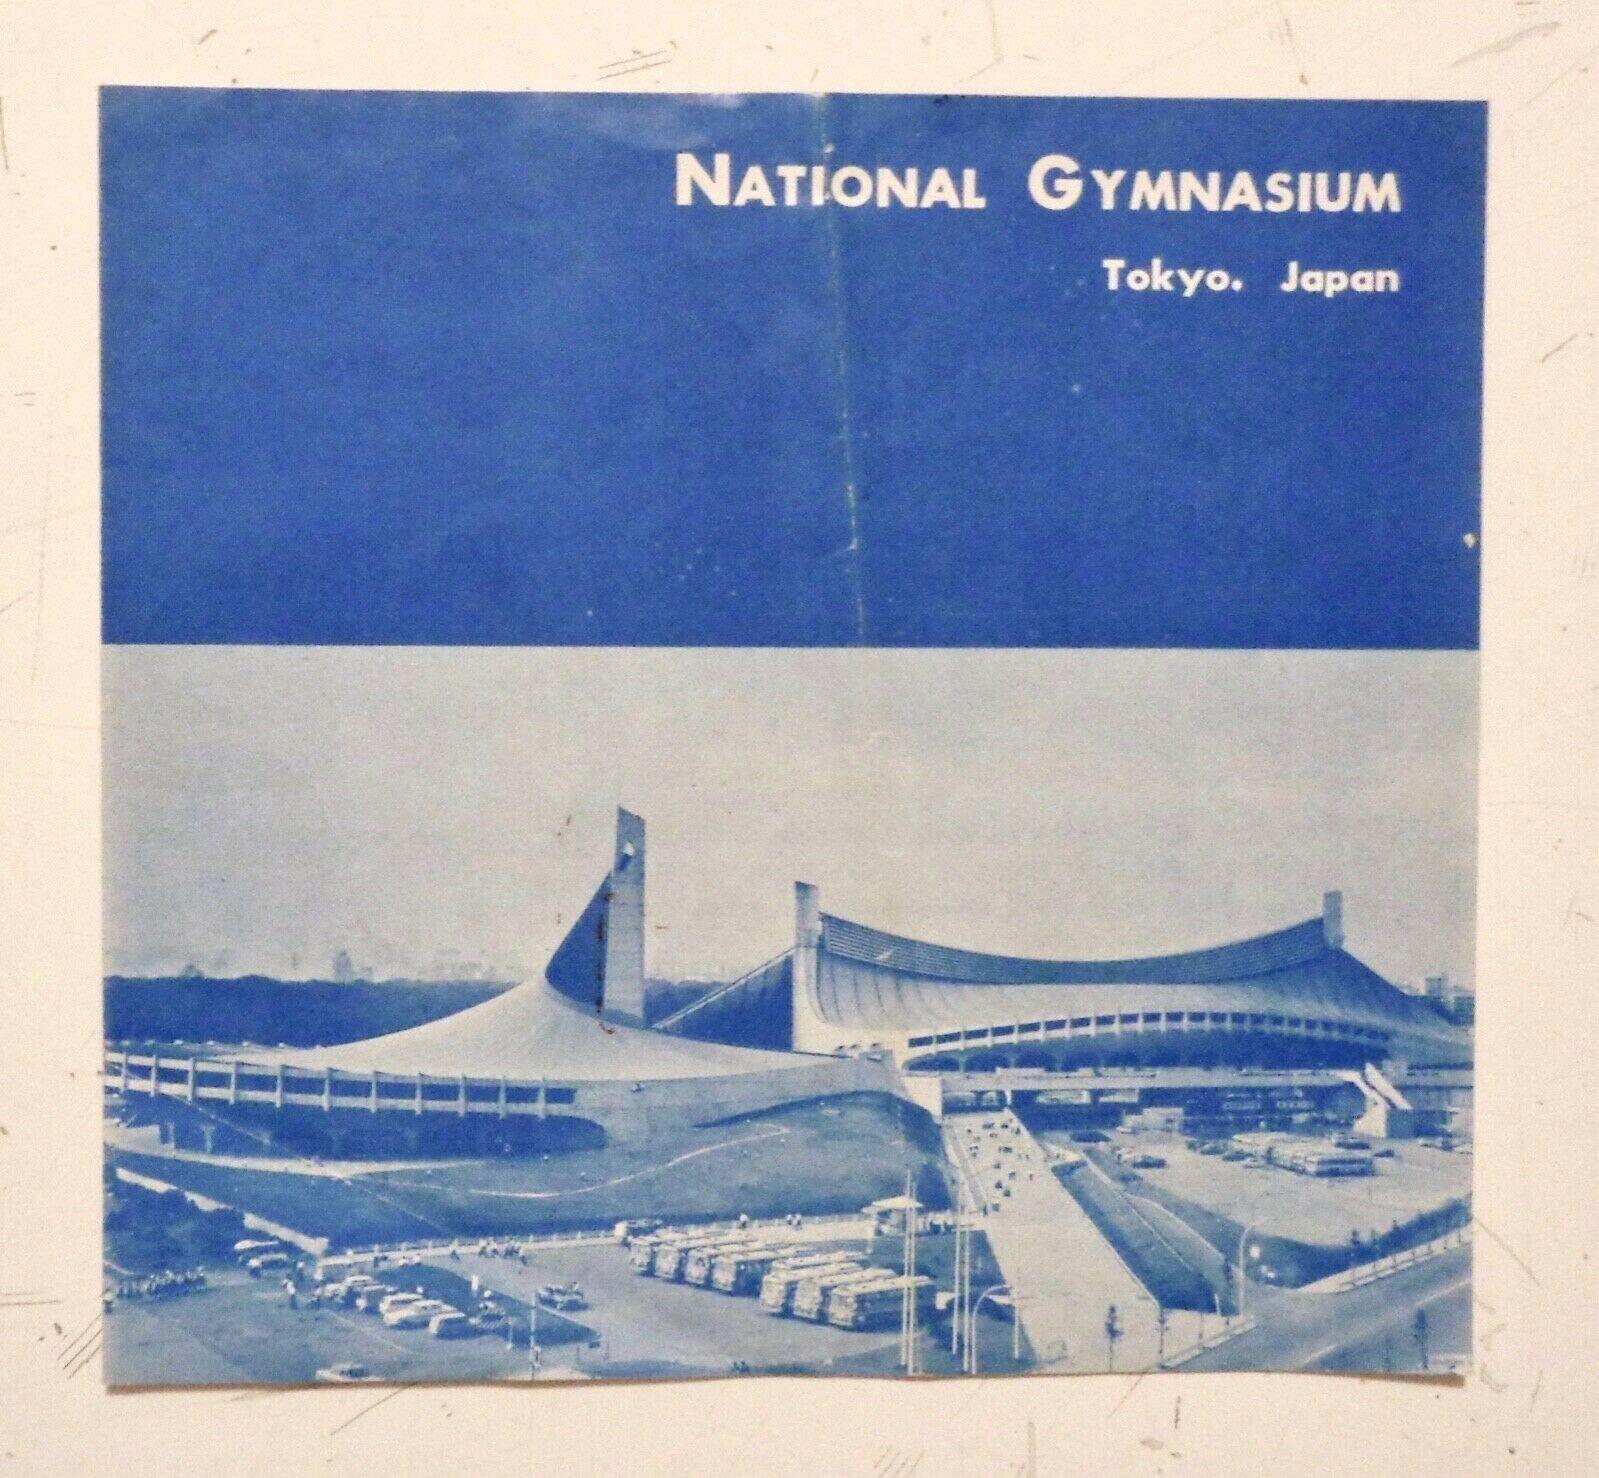 NATIONAL GYMNASIUM 1960s Brochure KENZO TANGE ARCHITECTURE Tokyo Japan Olympics